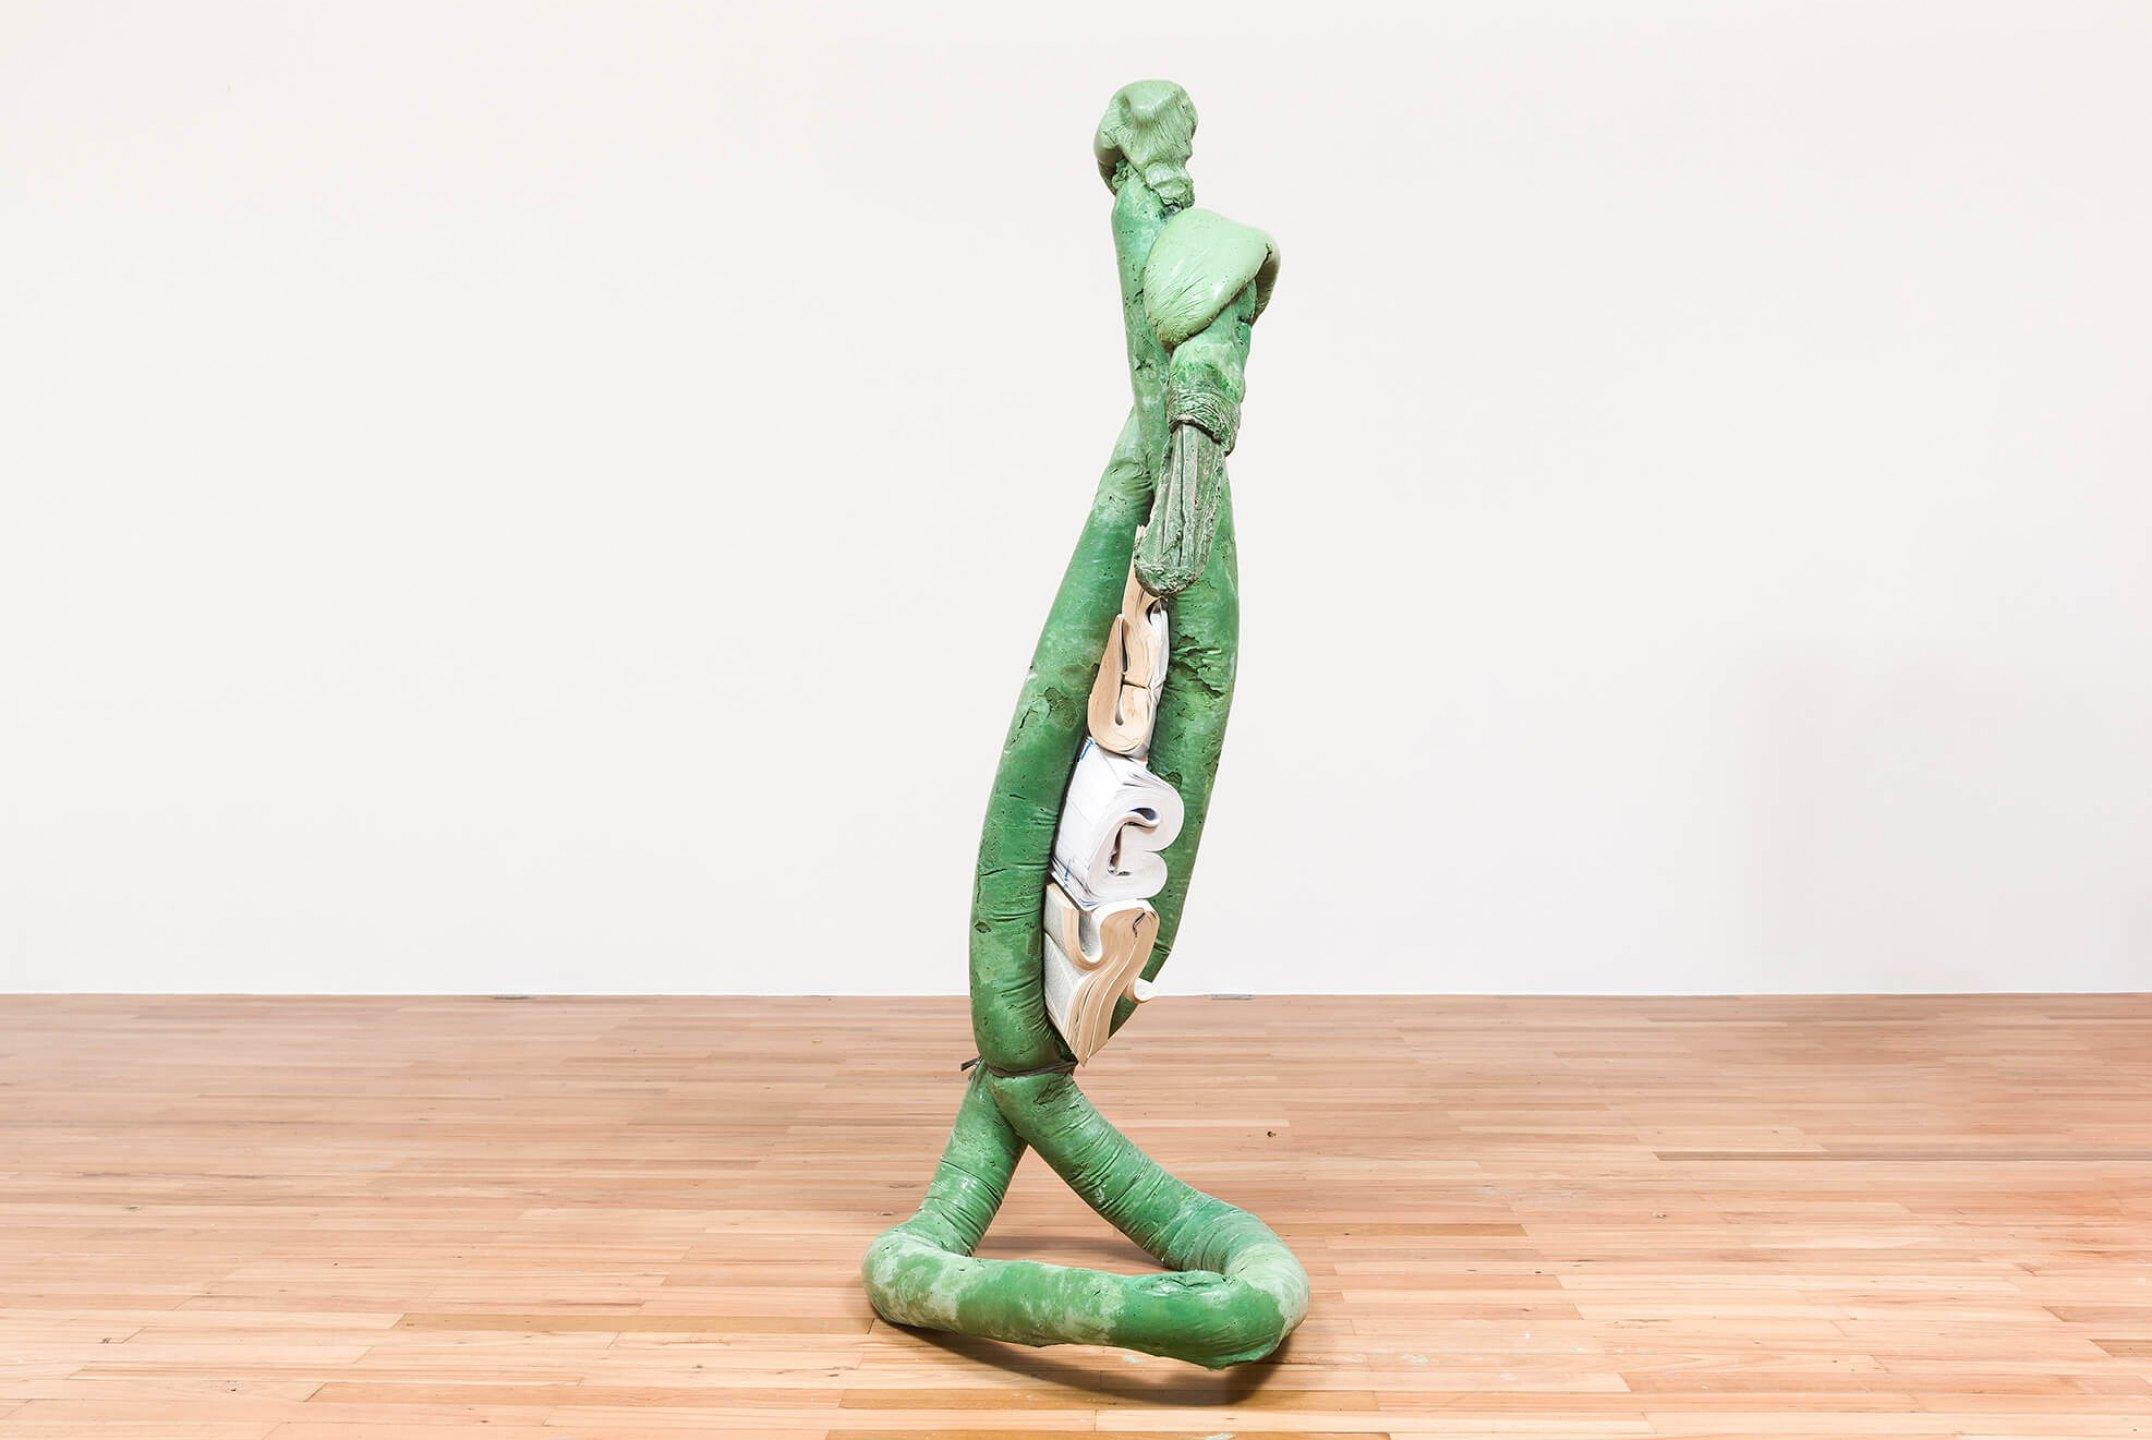 Michael Dean, <em>Analogue x x, now (Working Title)</em>,2015, concrete, dictionaries, string and paint - Mendes Wood DM